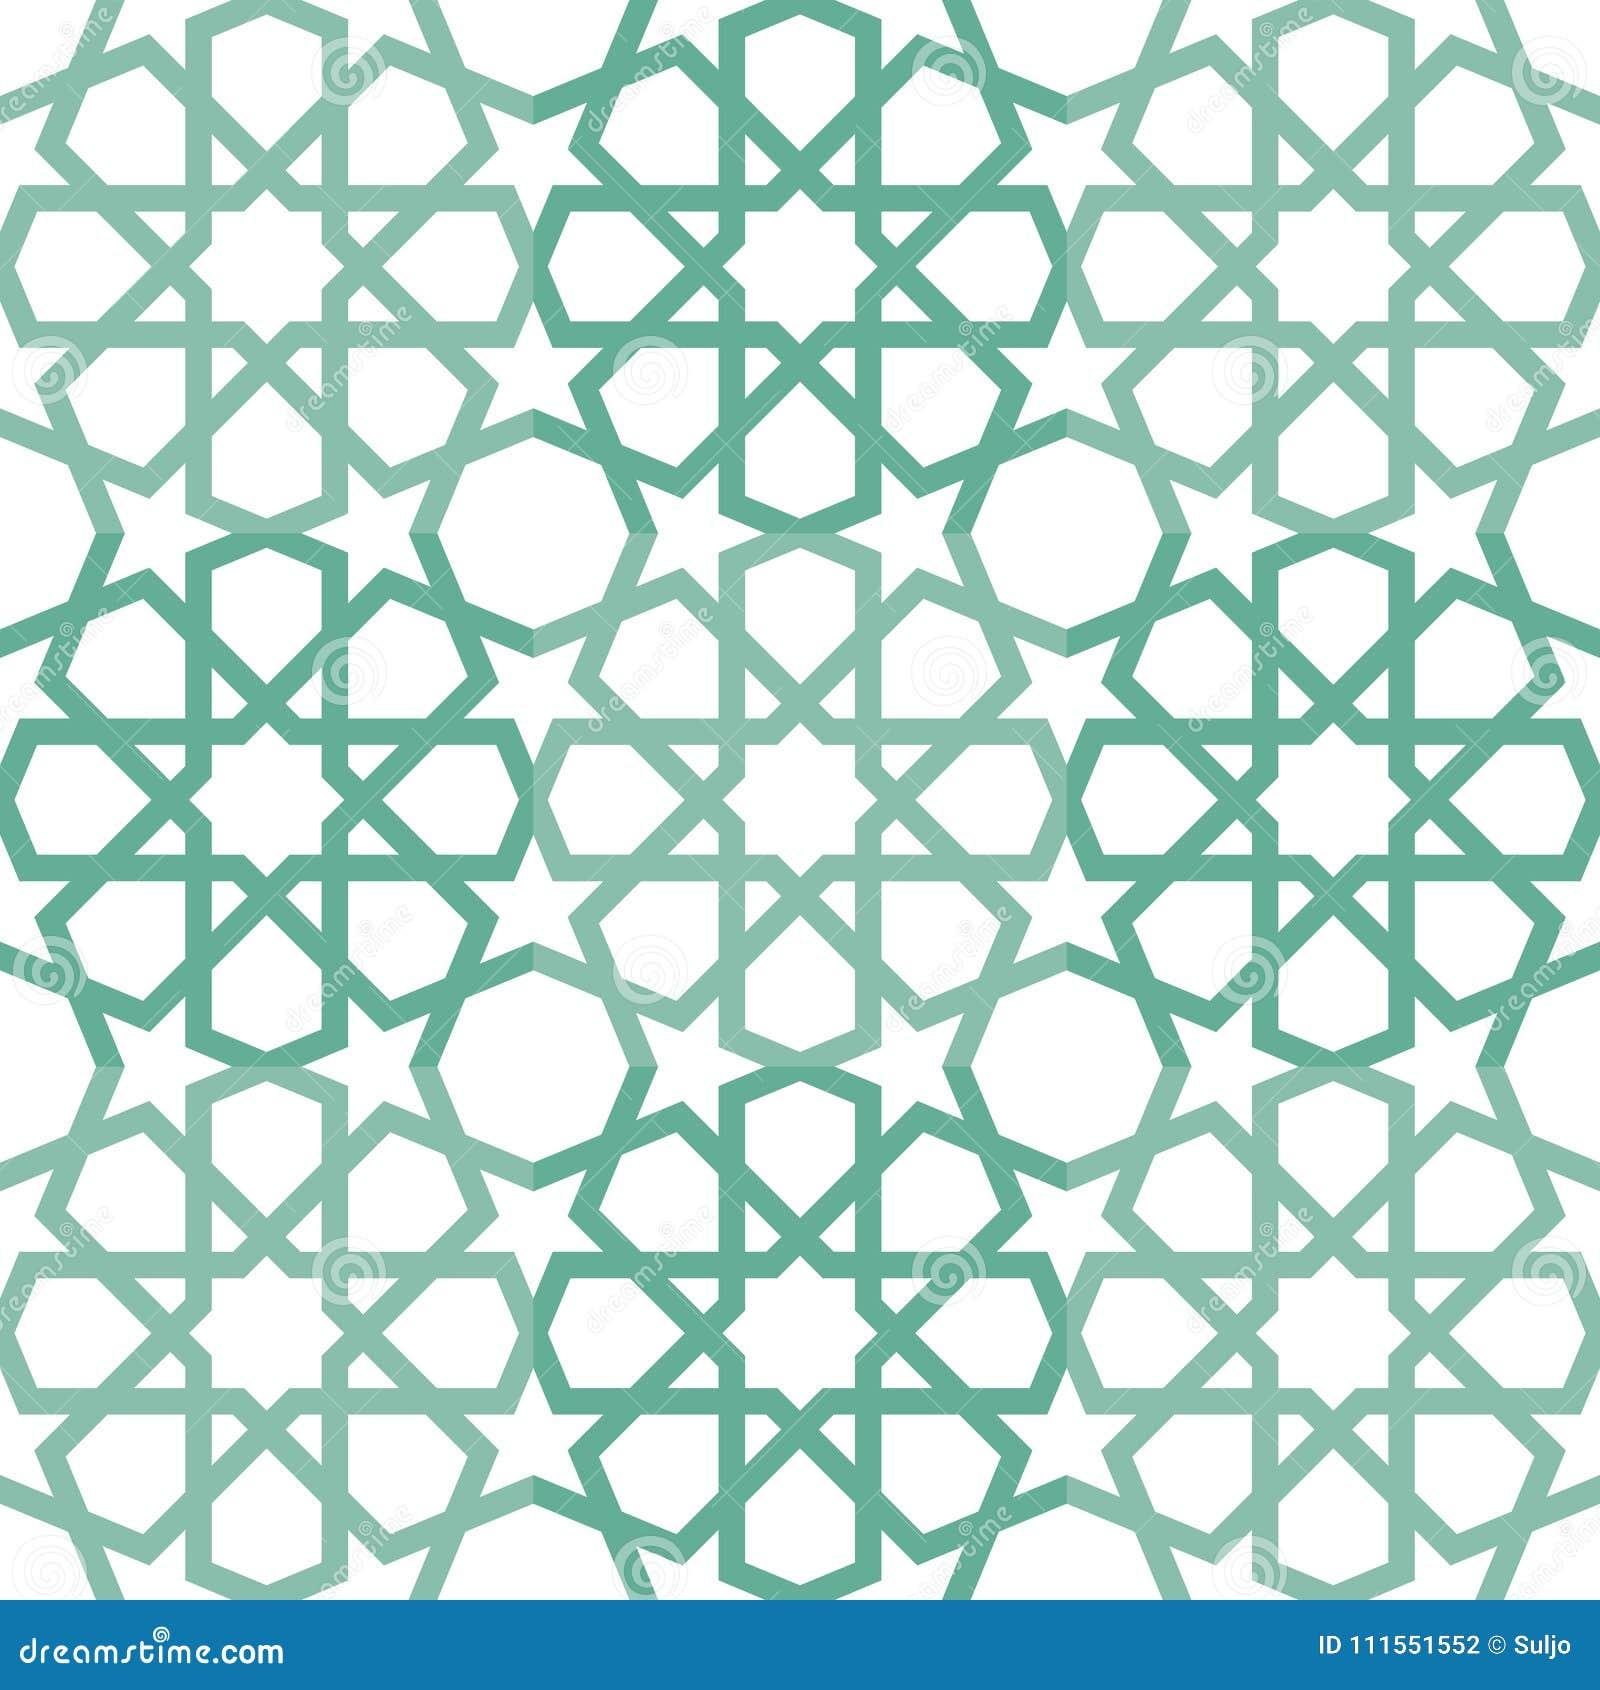 Islamic Tiling Pattern stock vector. Illustration of background ...